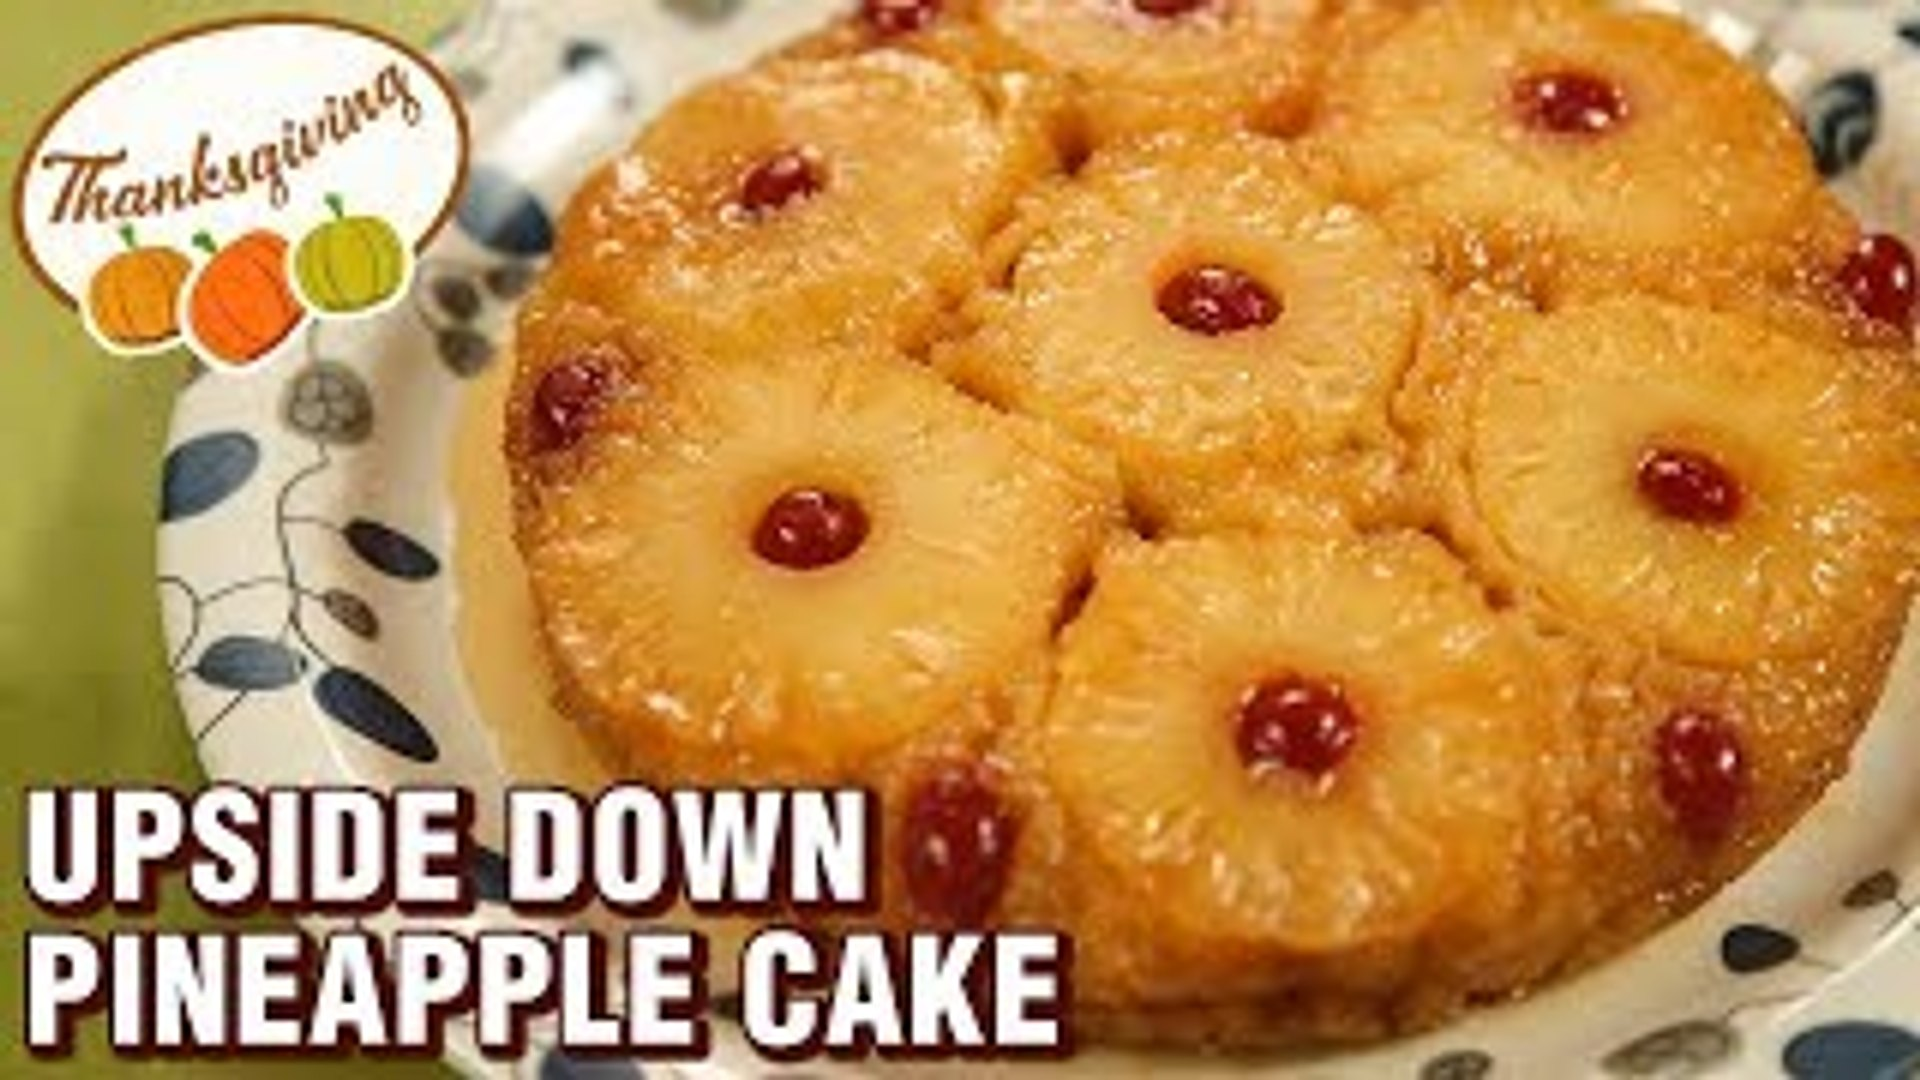 Thanksgiving Special Recipe - Pineapple Upside Down Cake - Easy Fruit Cake - Varun